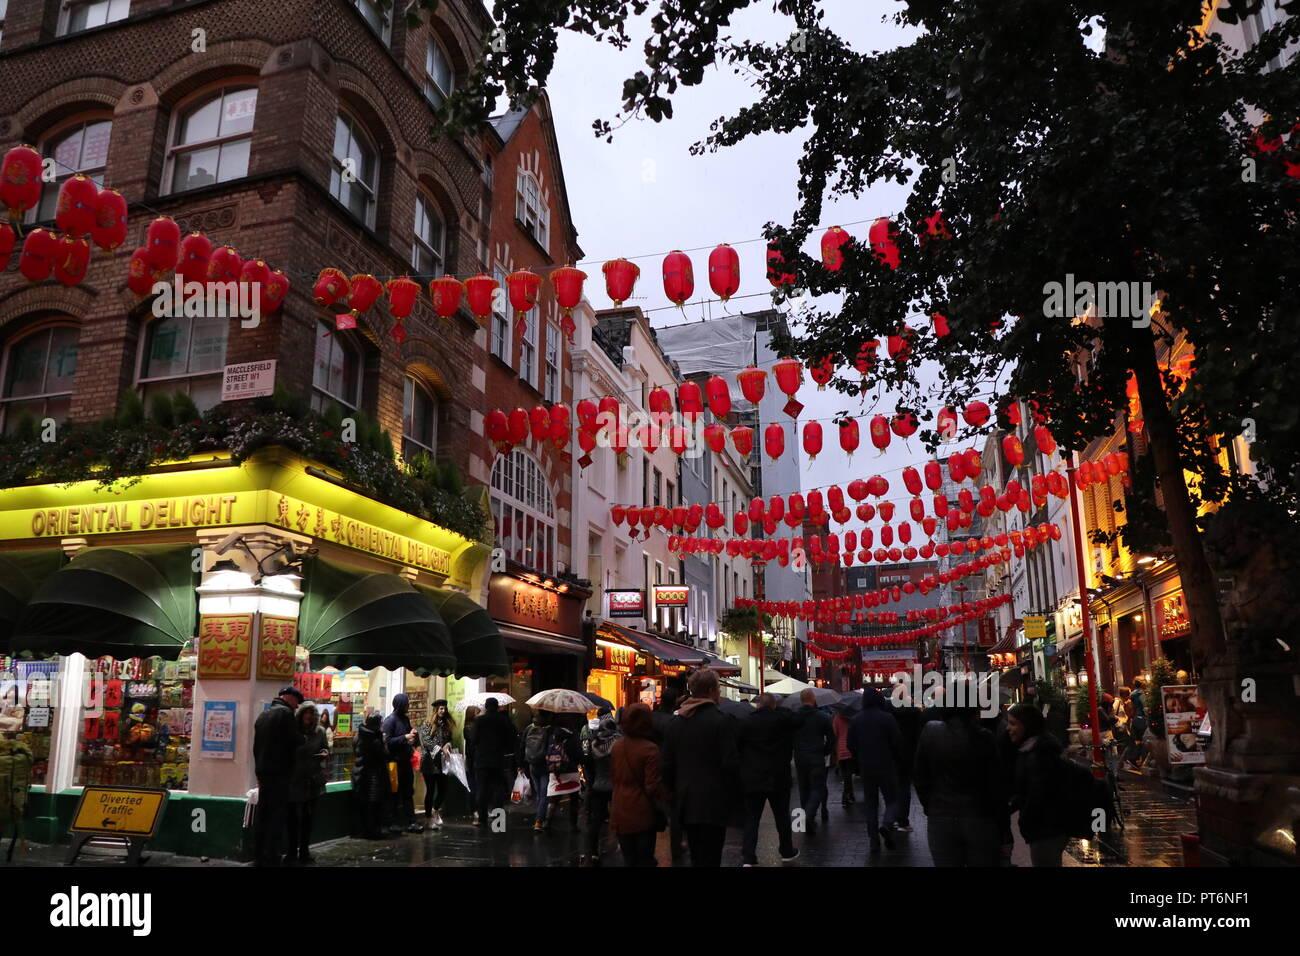 China Town London 2018 - Stock Image